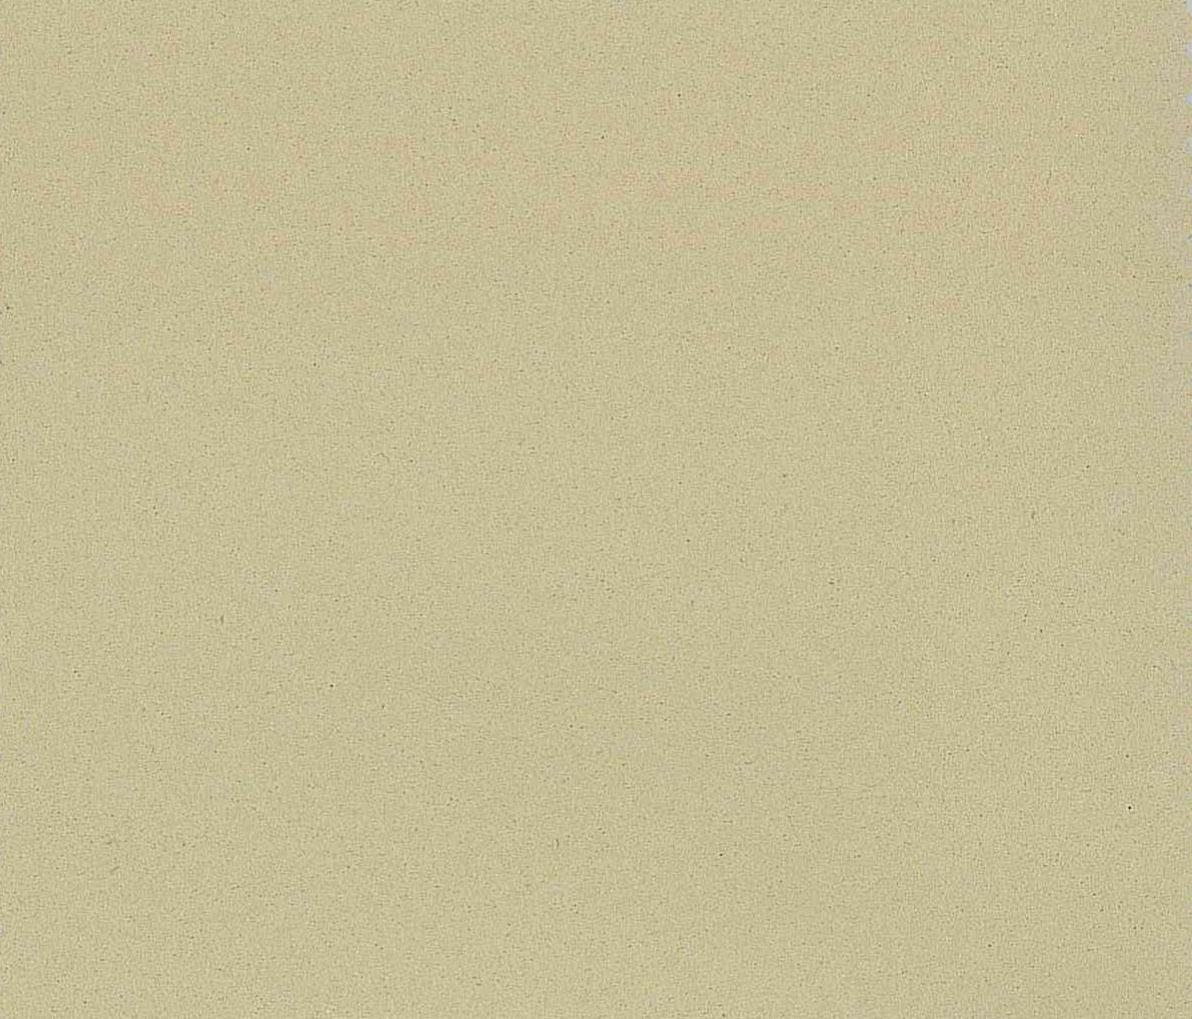 acualis nora 007 au enbezugsstoffe von alonso mercader architonic. Black Bedroom Furniture Sets. Home Design Ideas